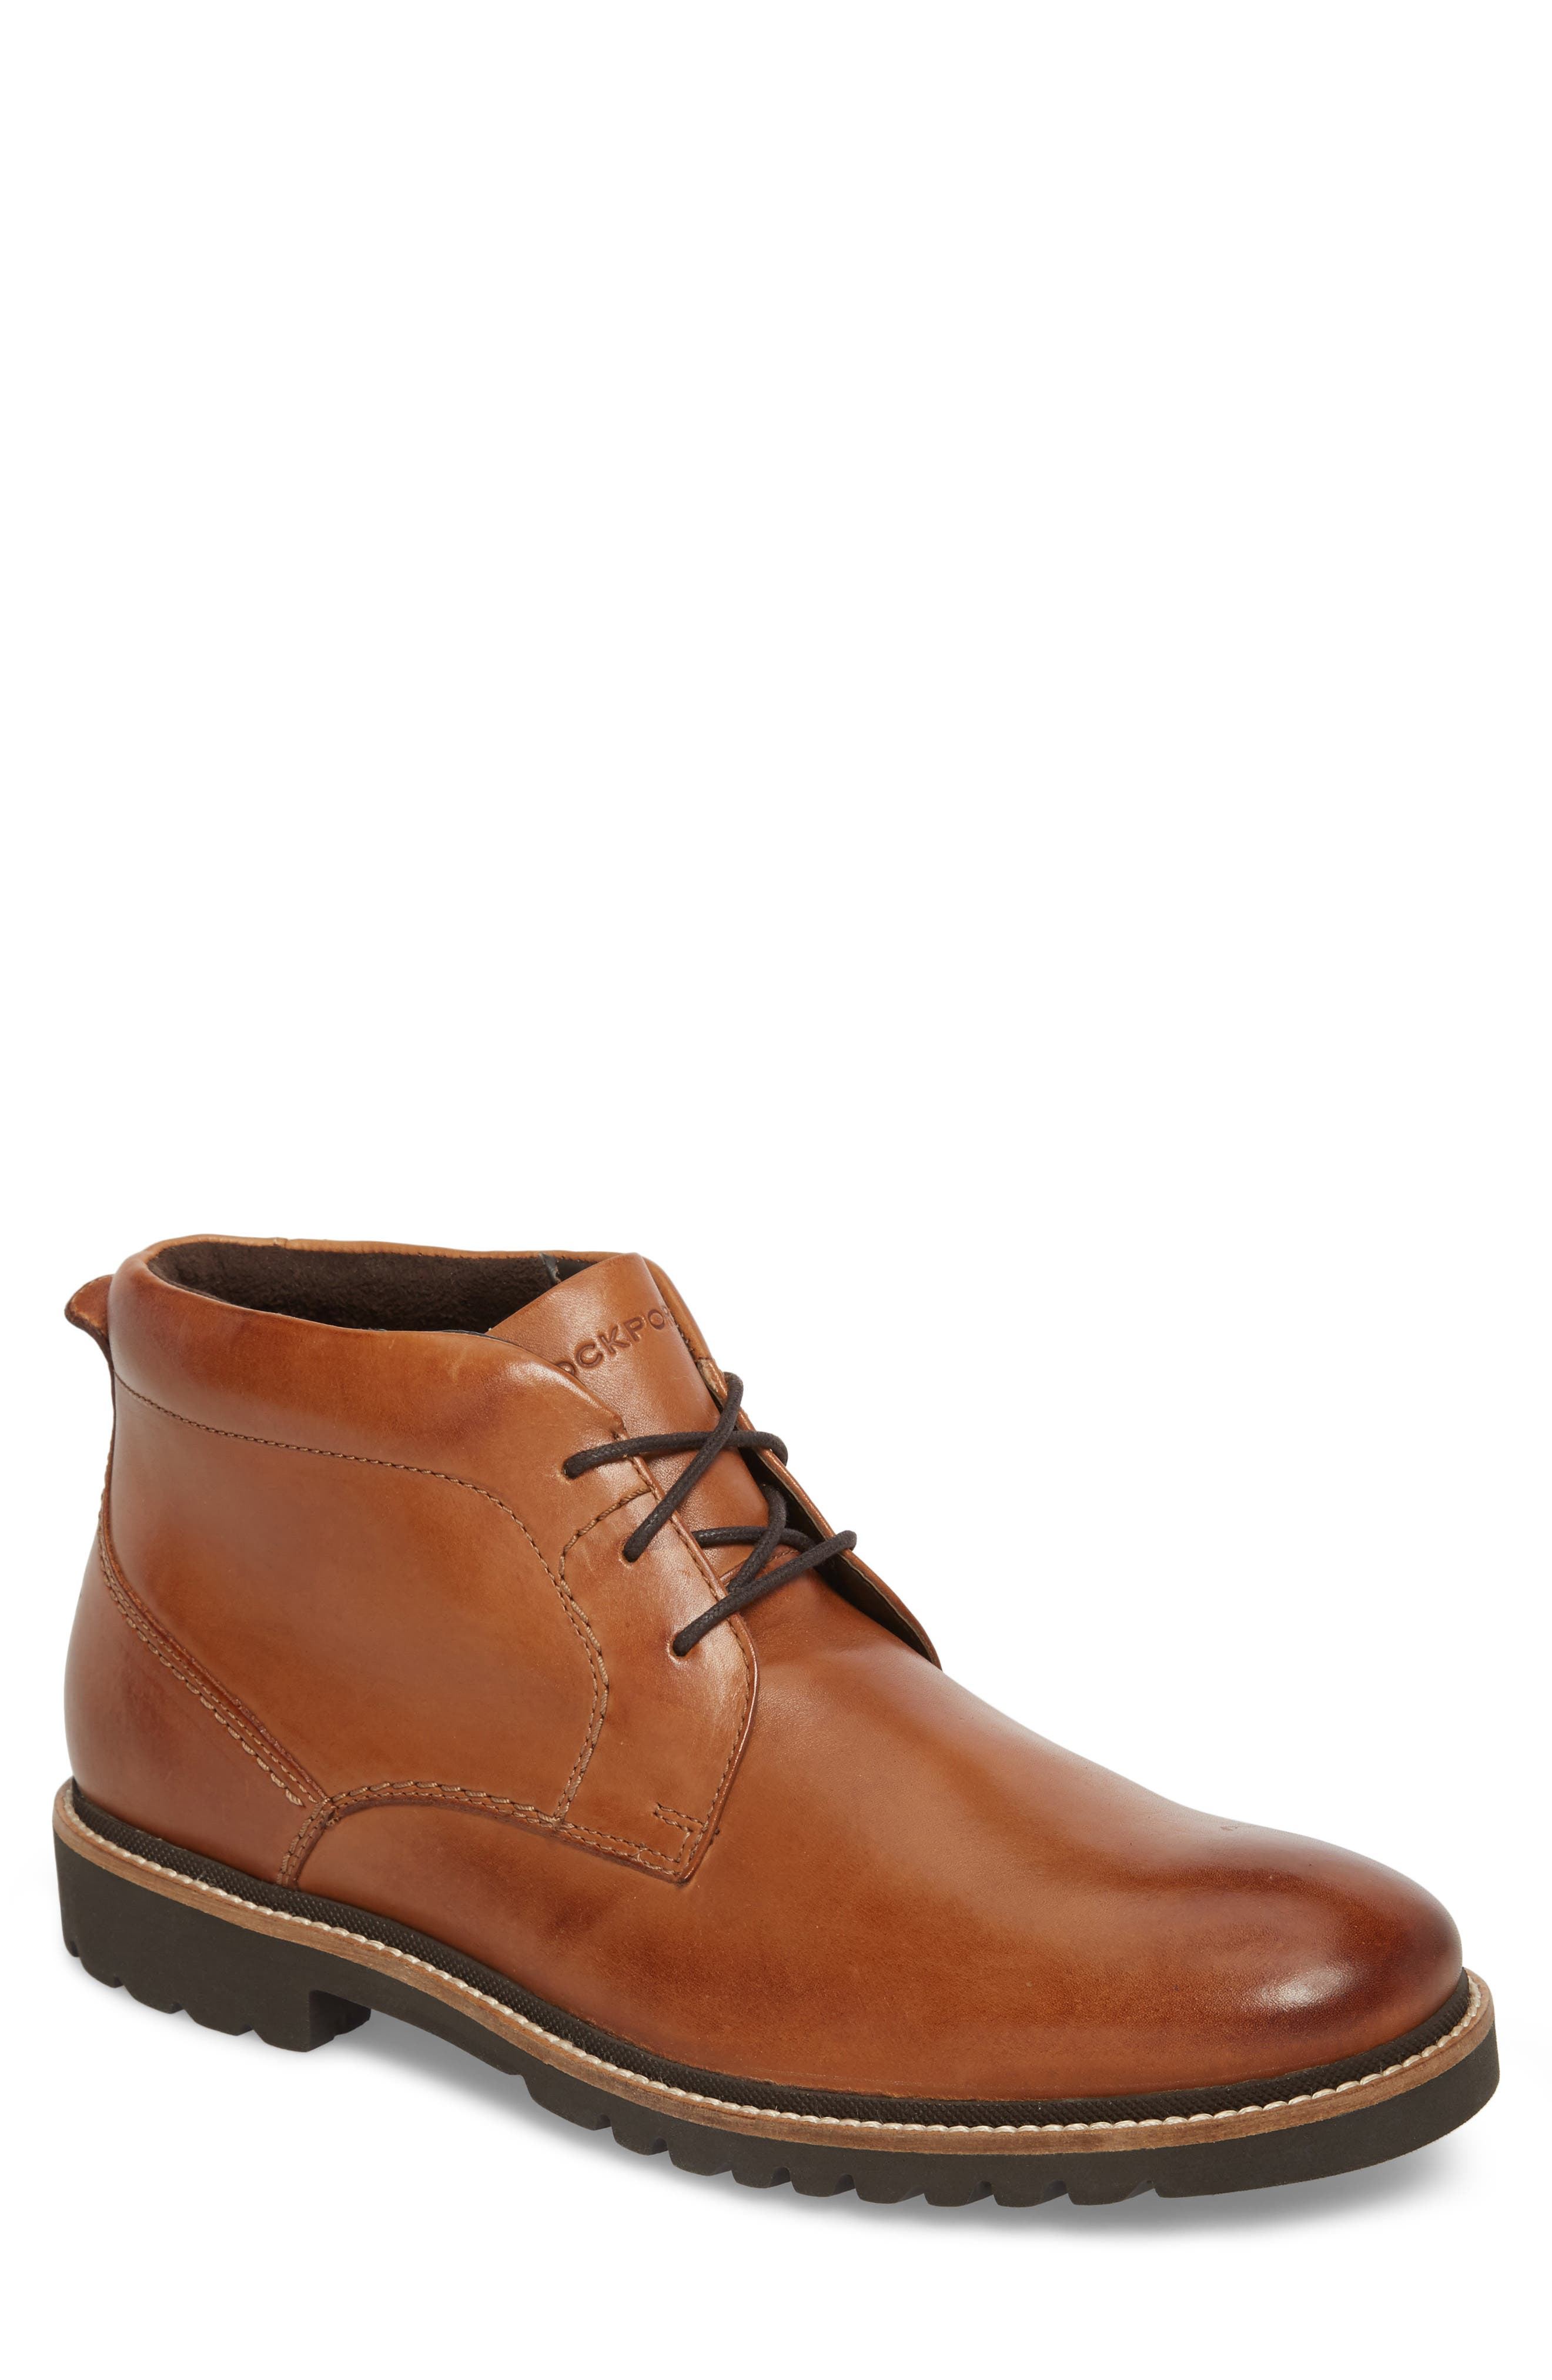 Marshall Chukka Boot,                         Main,                         color, Cognac Leather